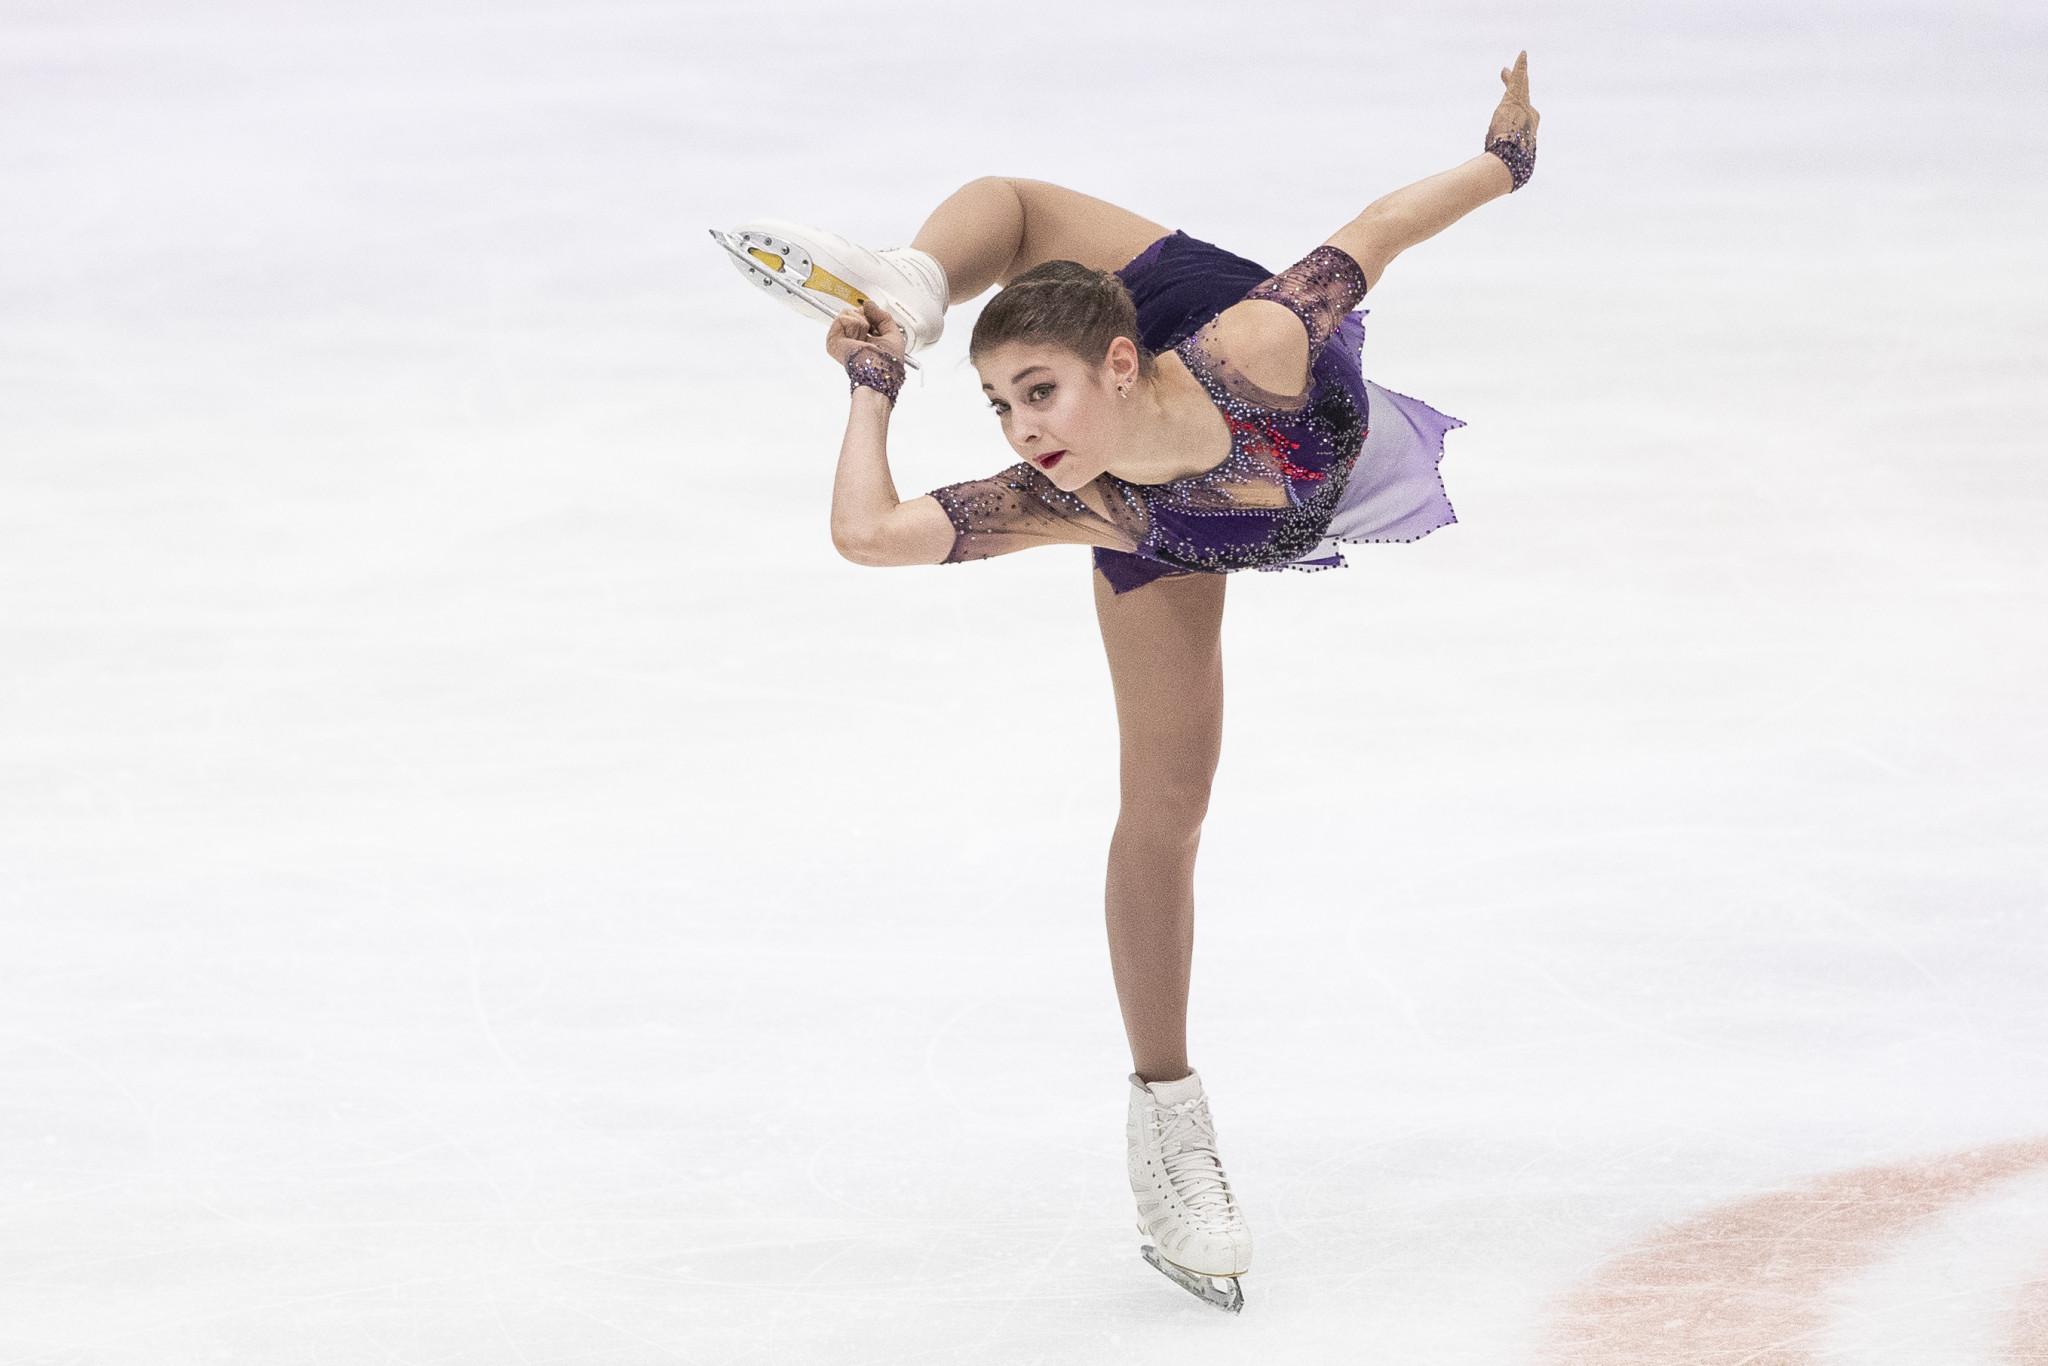 Kostornaia victory ensures Russian gold medal clean sweep at ISU European Figure Skating Championships